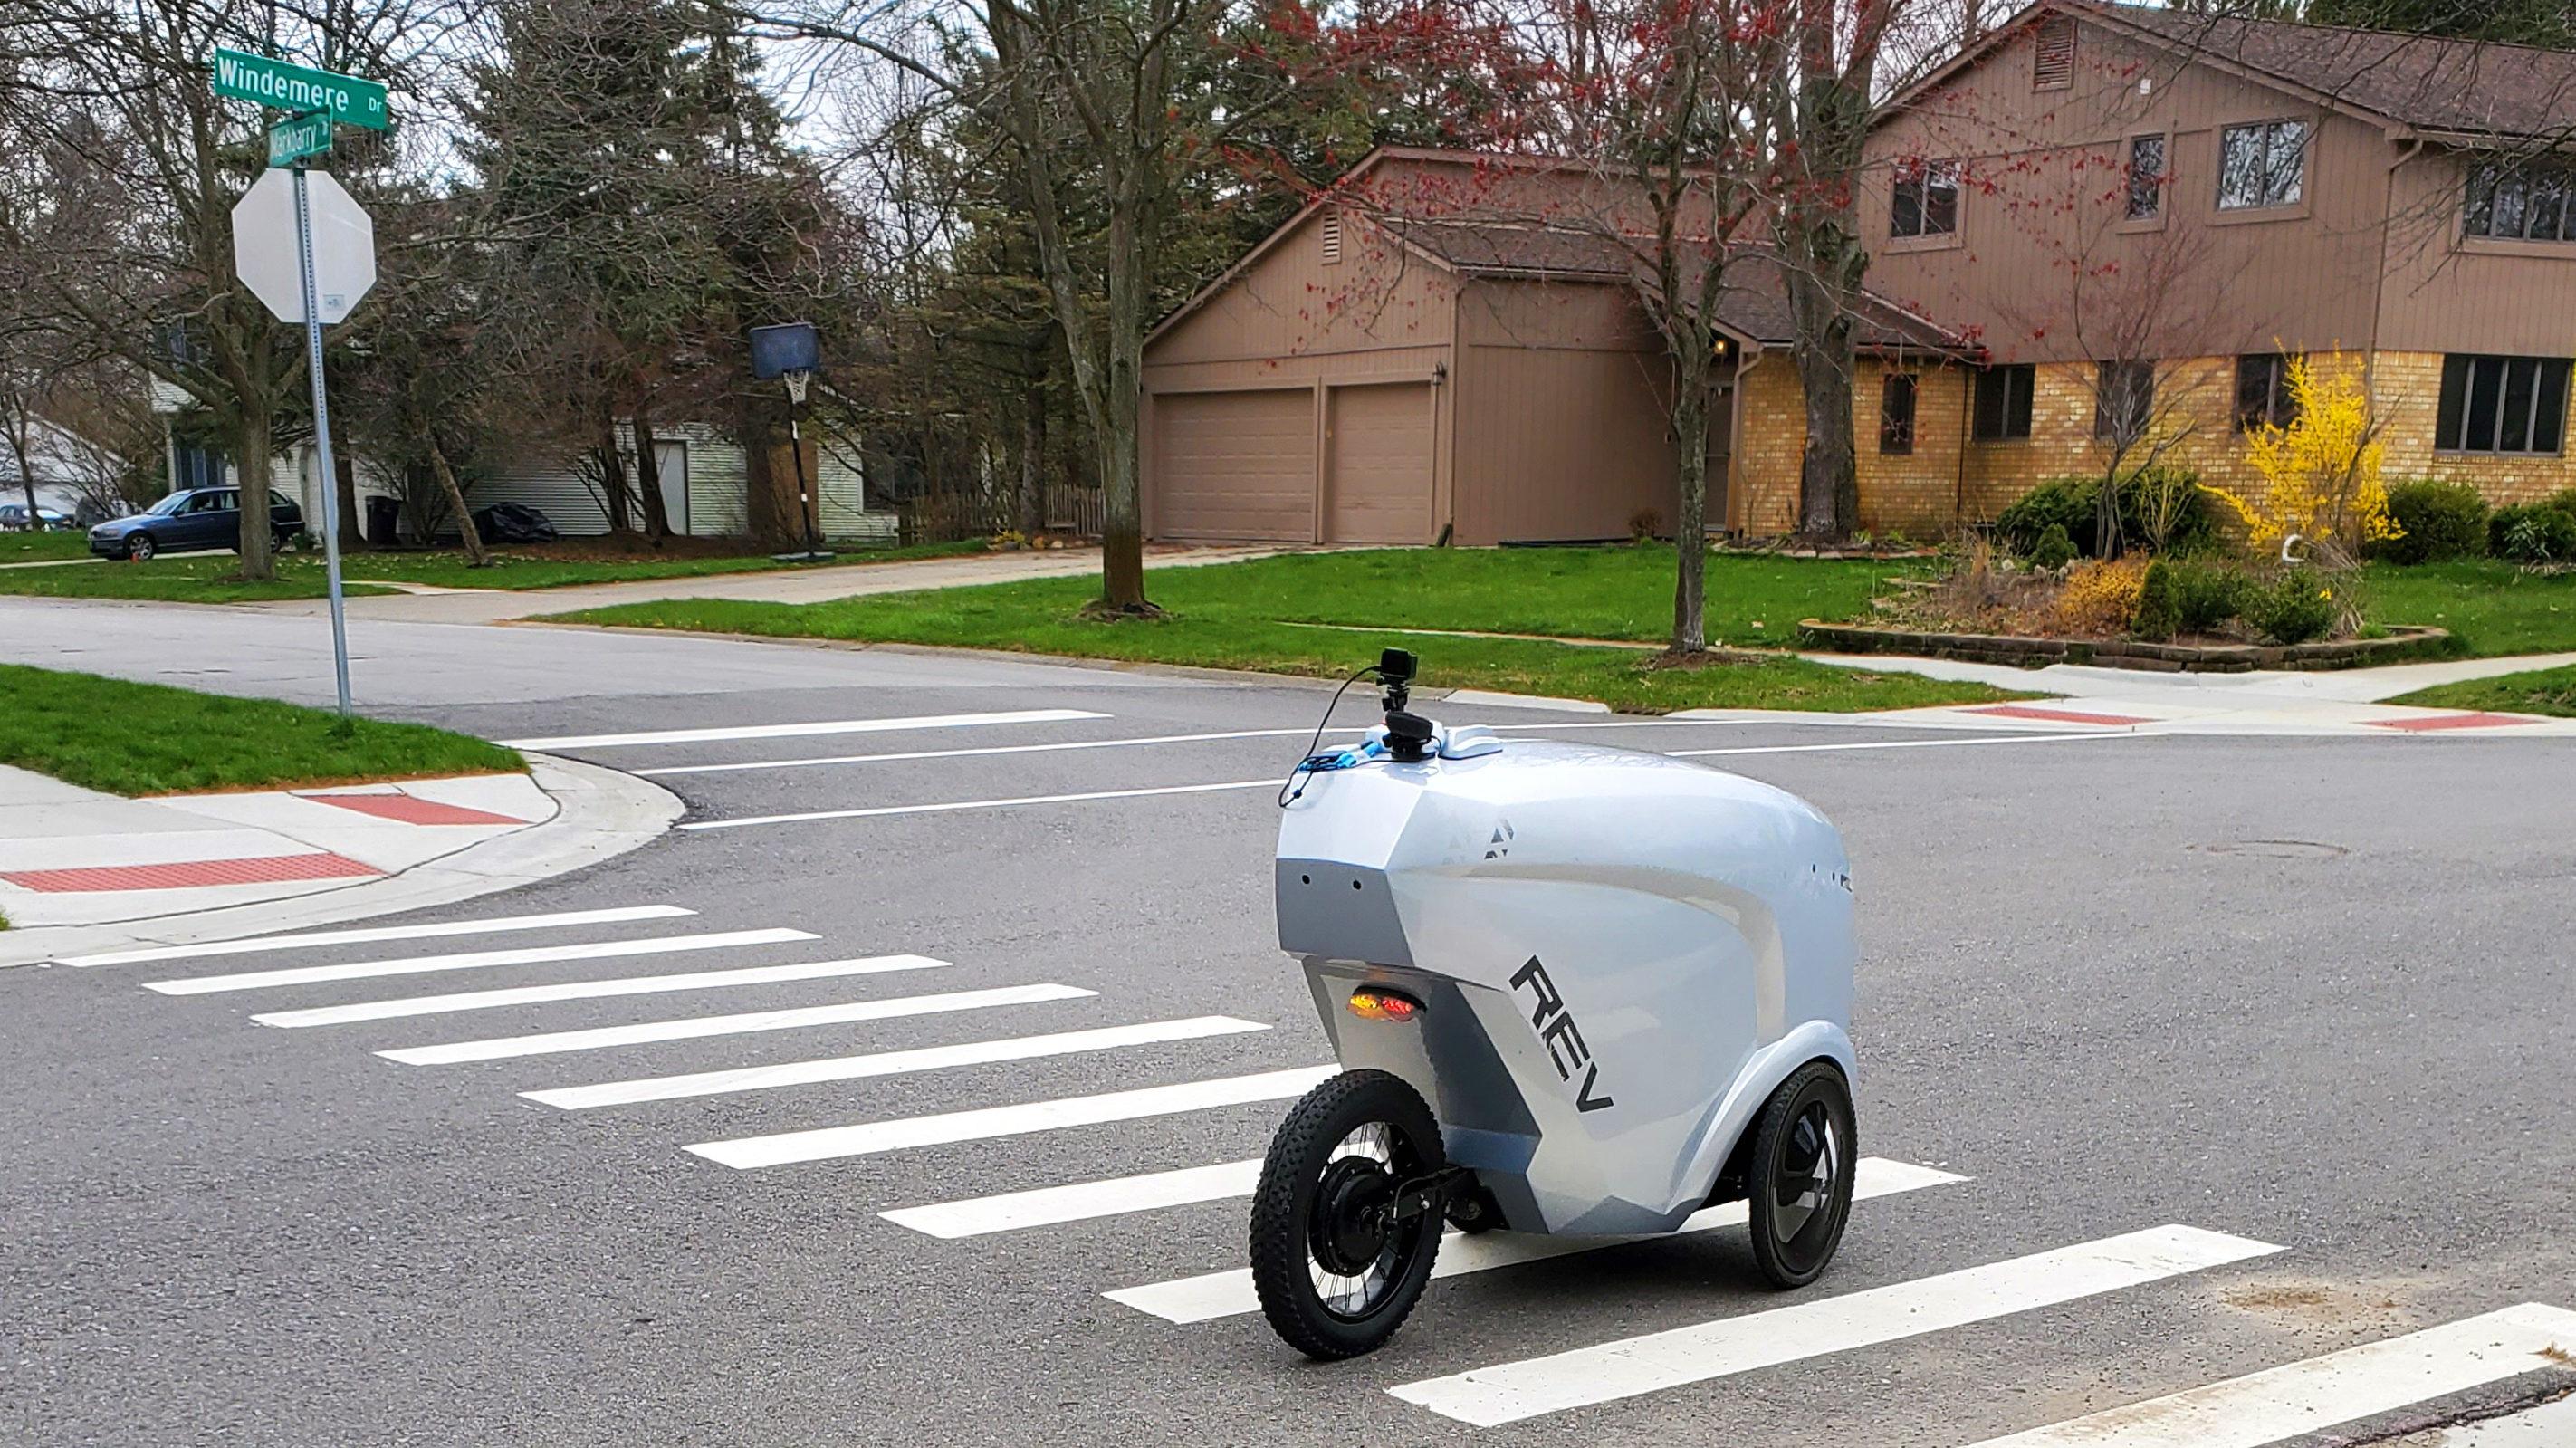 REV-1 delivery robot